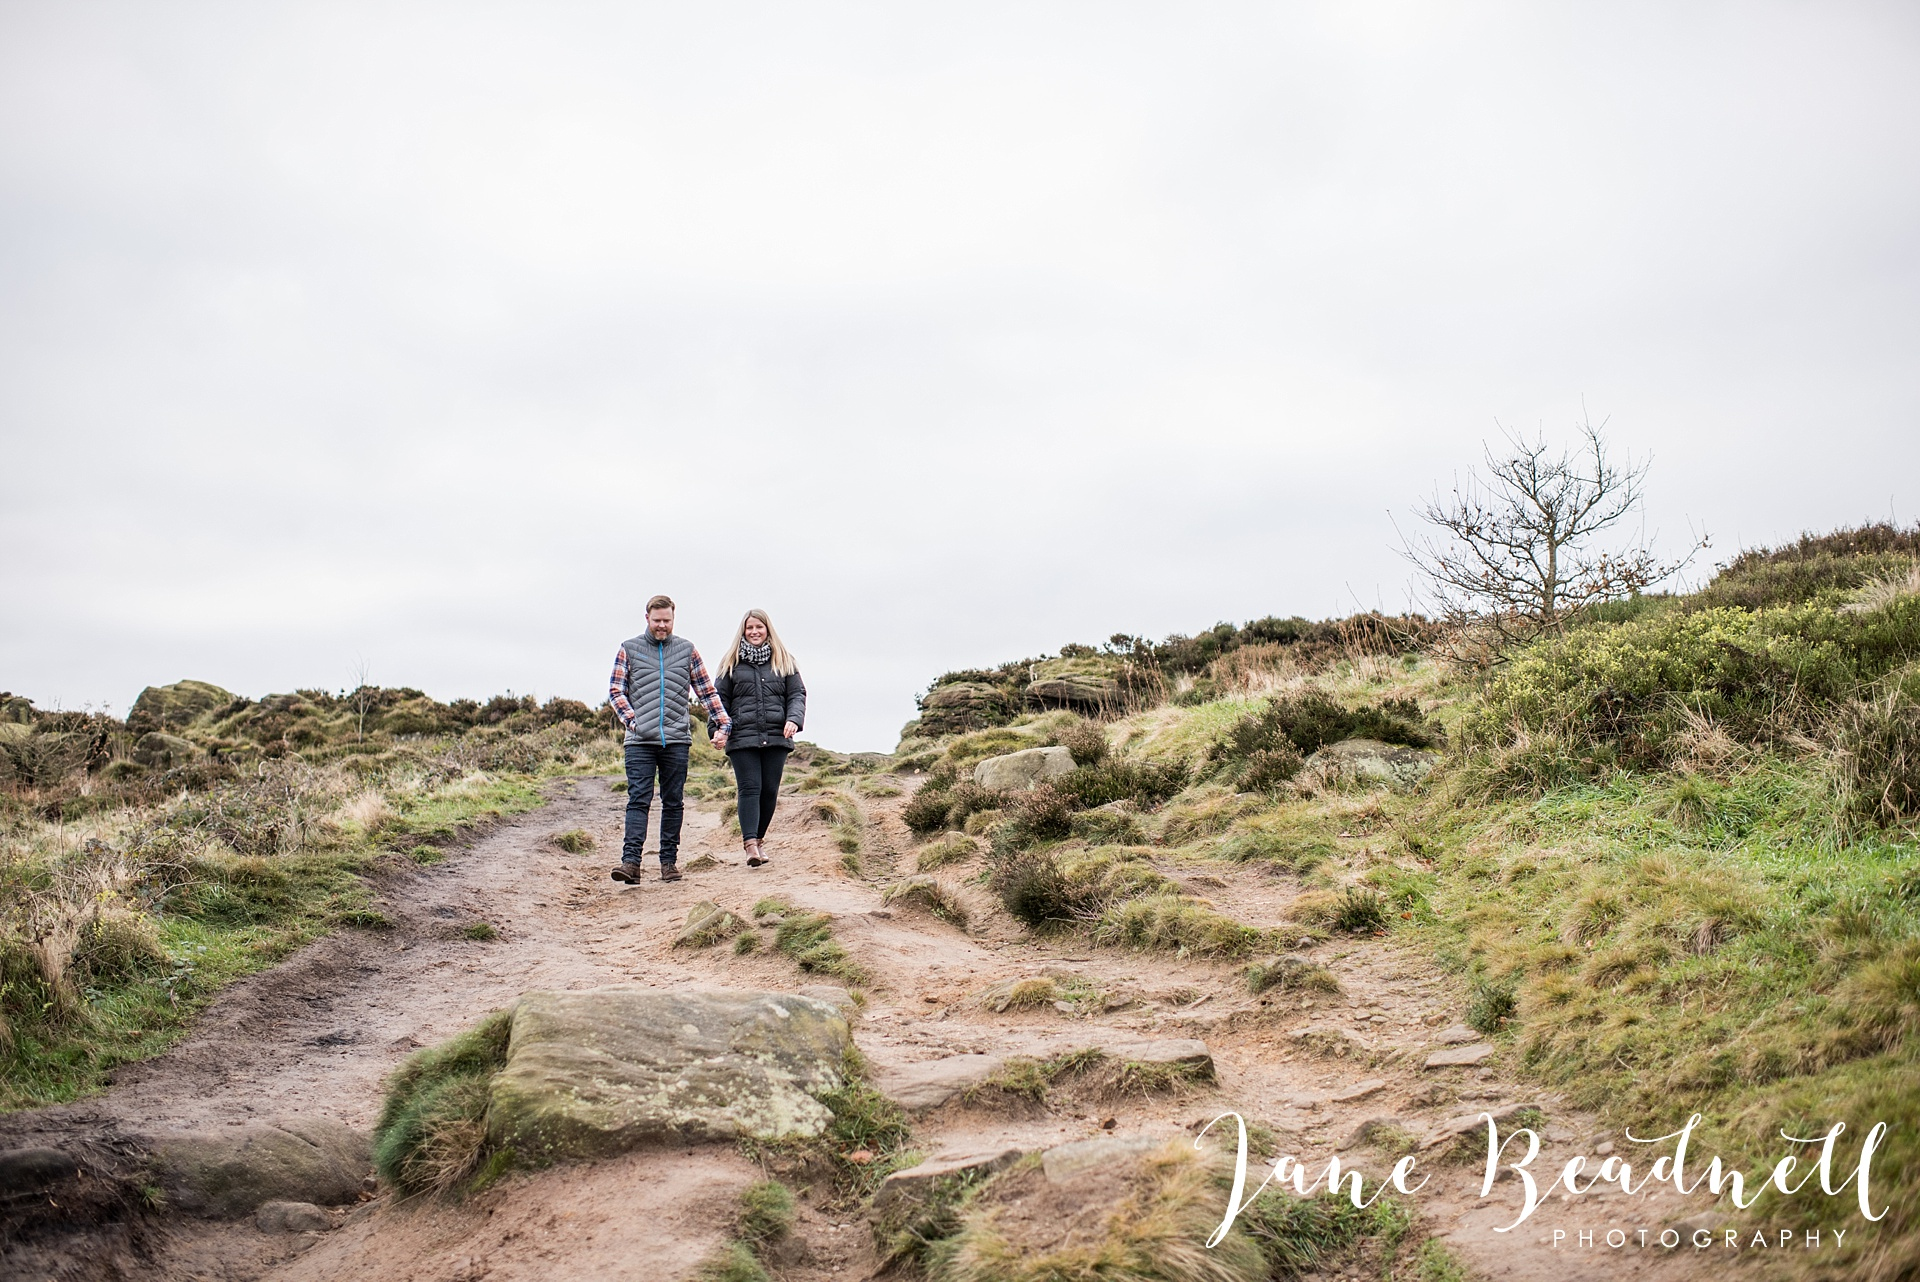 yorkshire-wedding-photographer-jane-beadnell-photography-uk-and-destination-wedding-photographer-engagement-shoot_0005